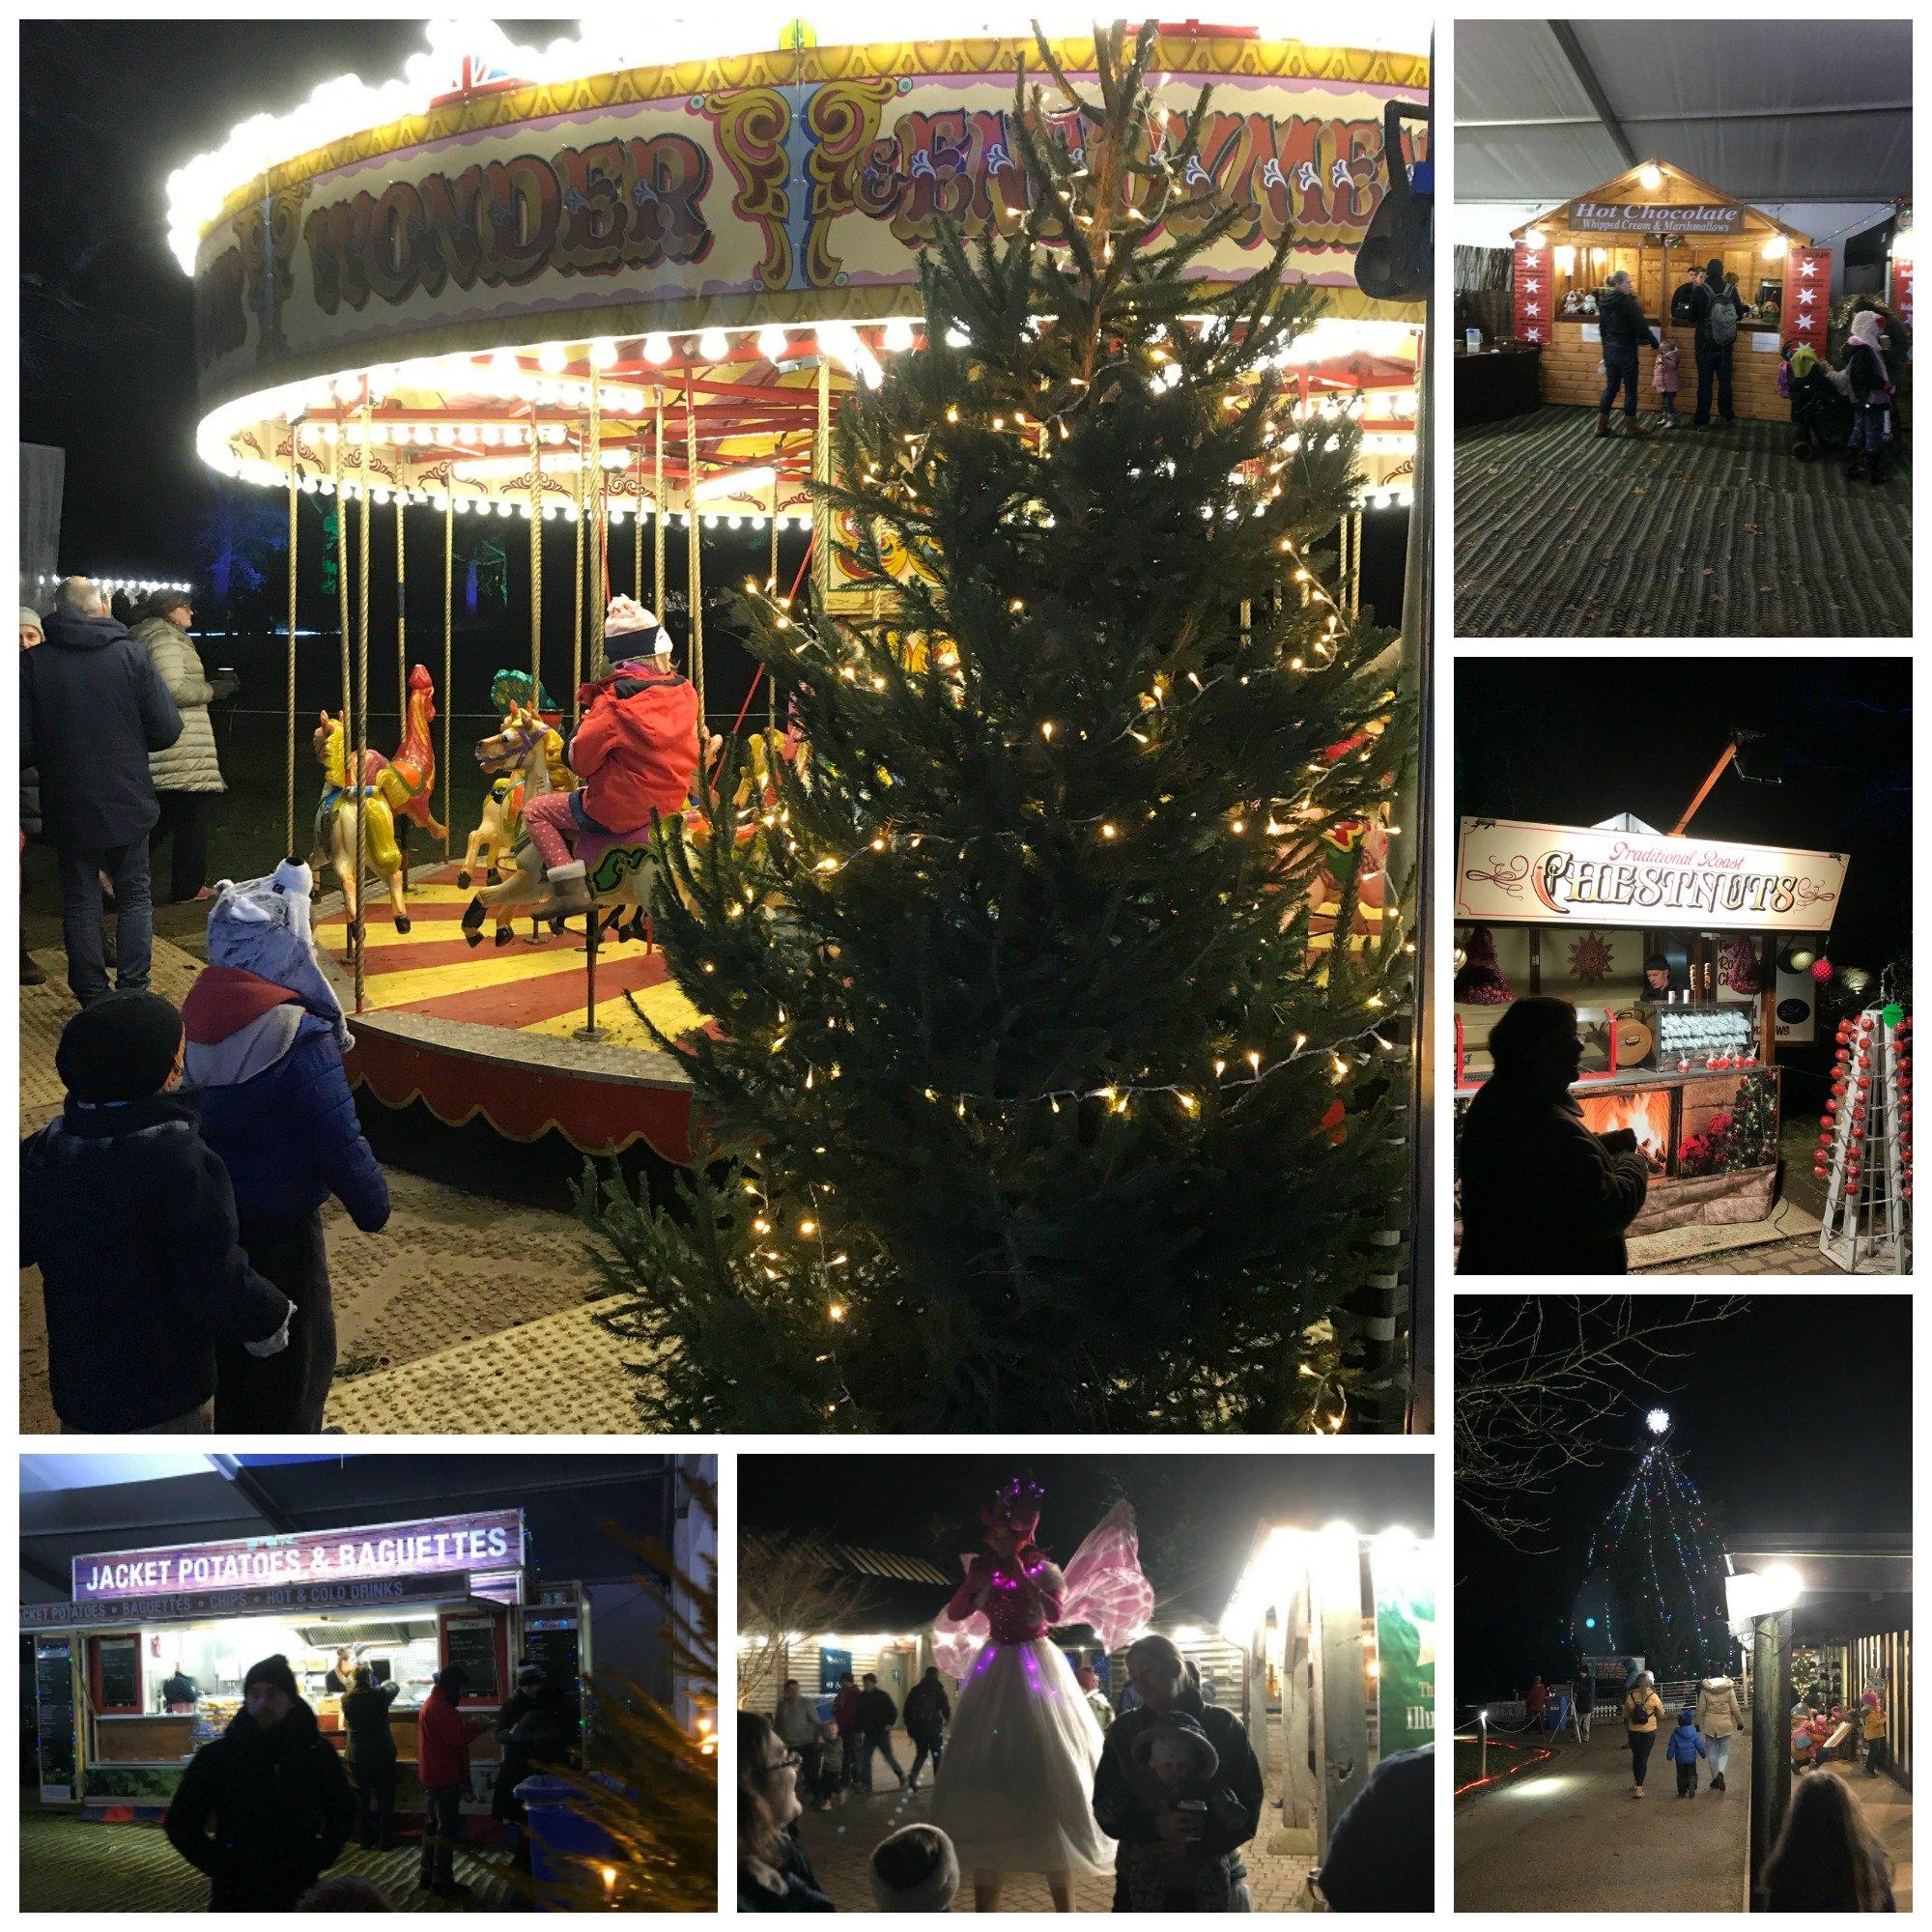 The Christmas Village at the Westonbirt Arboretum Enchanted Christmas Trail 2017